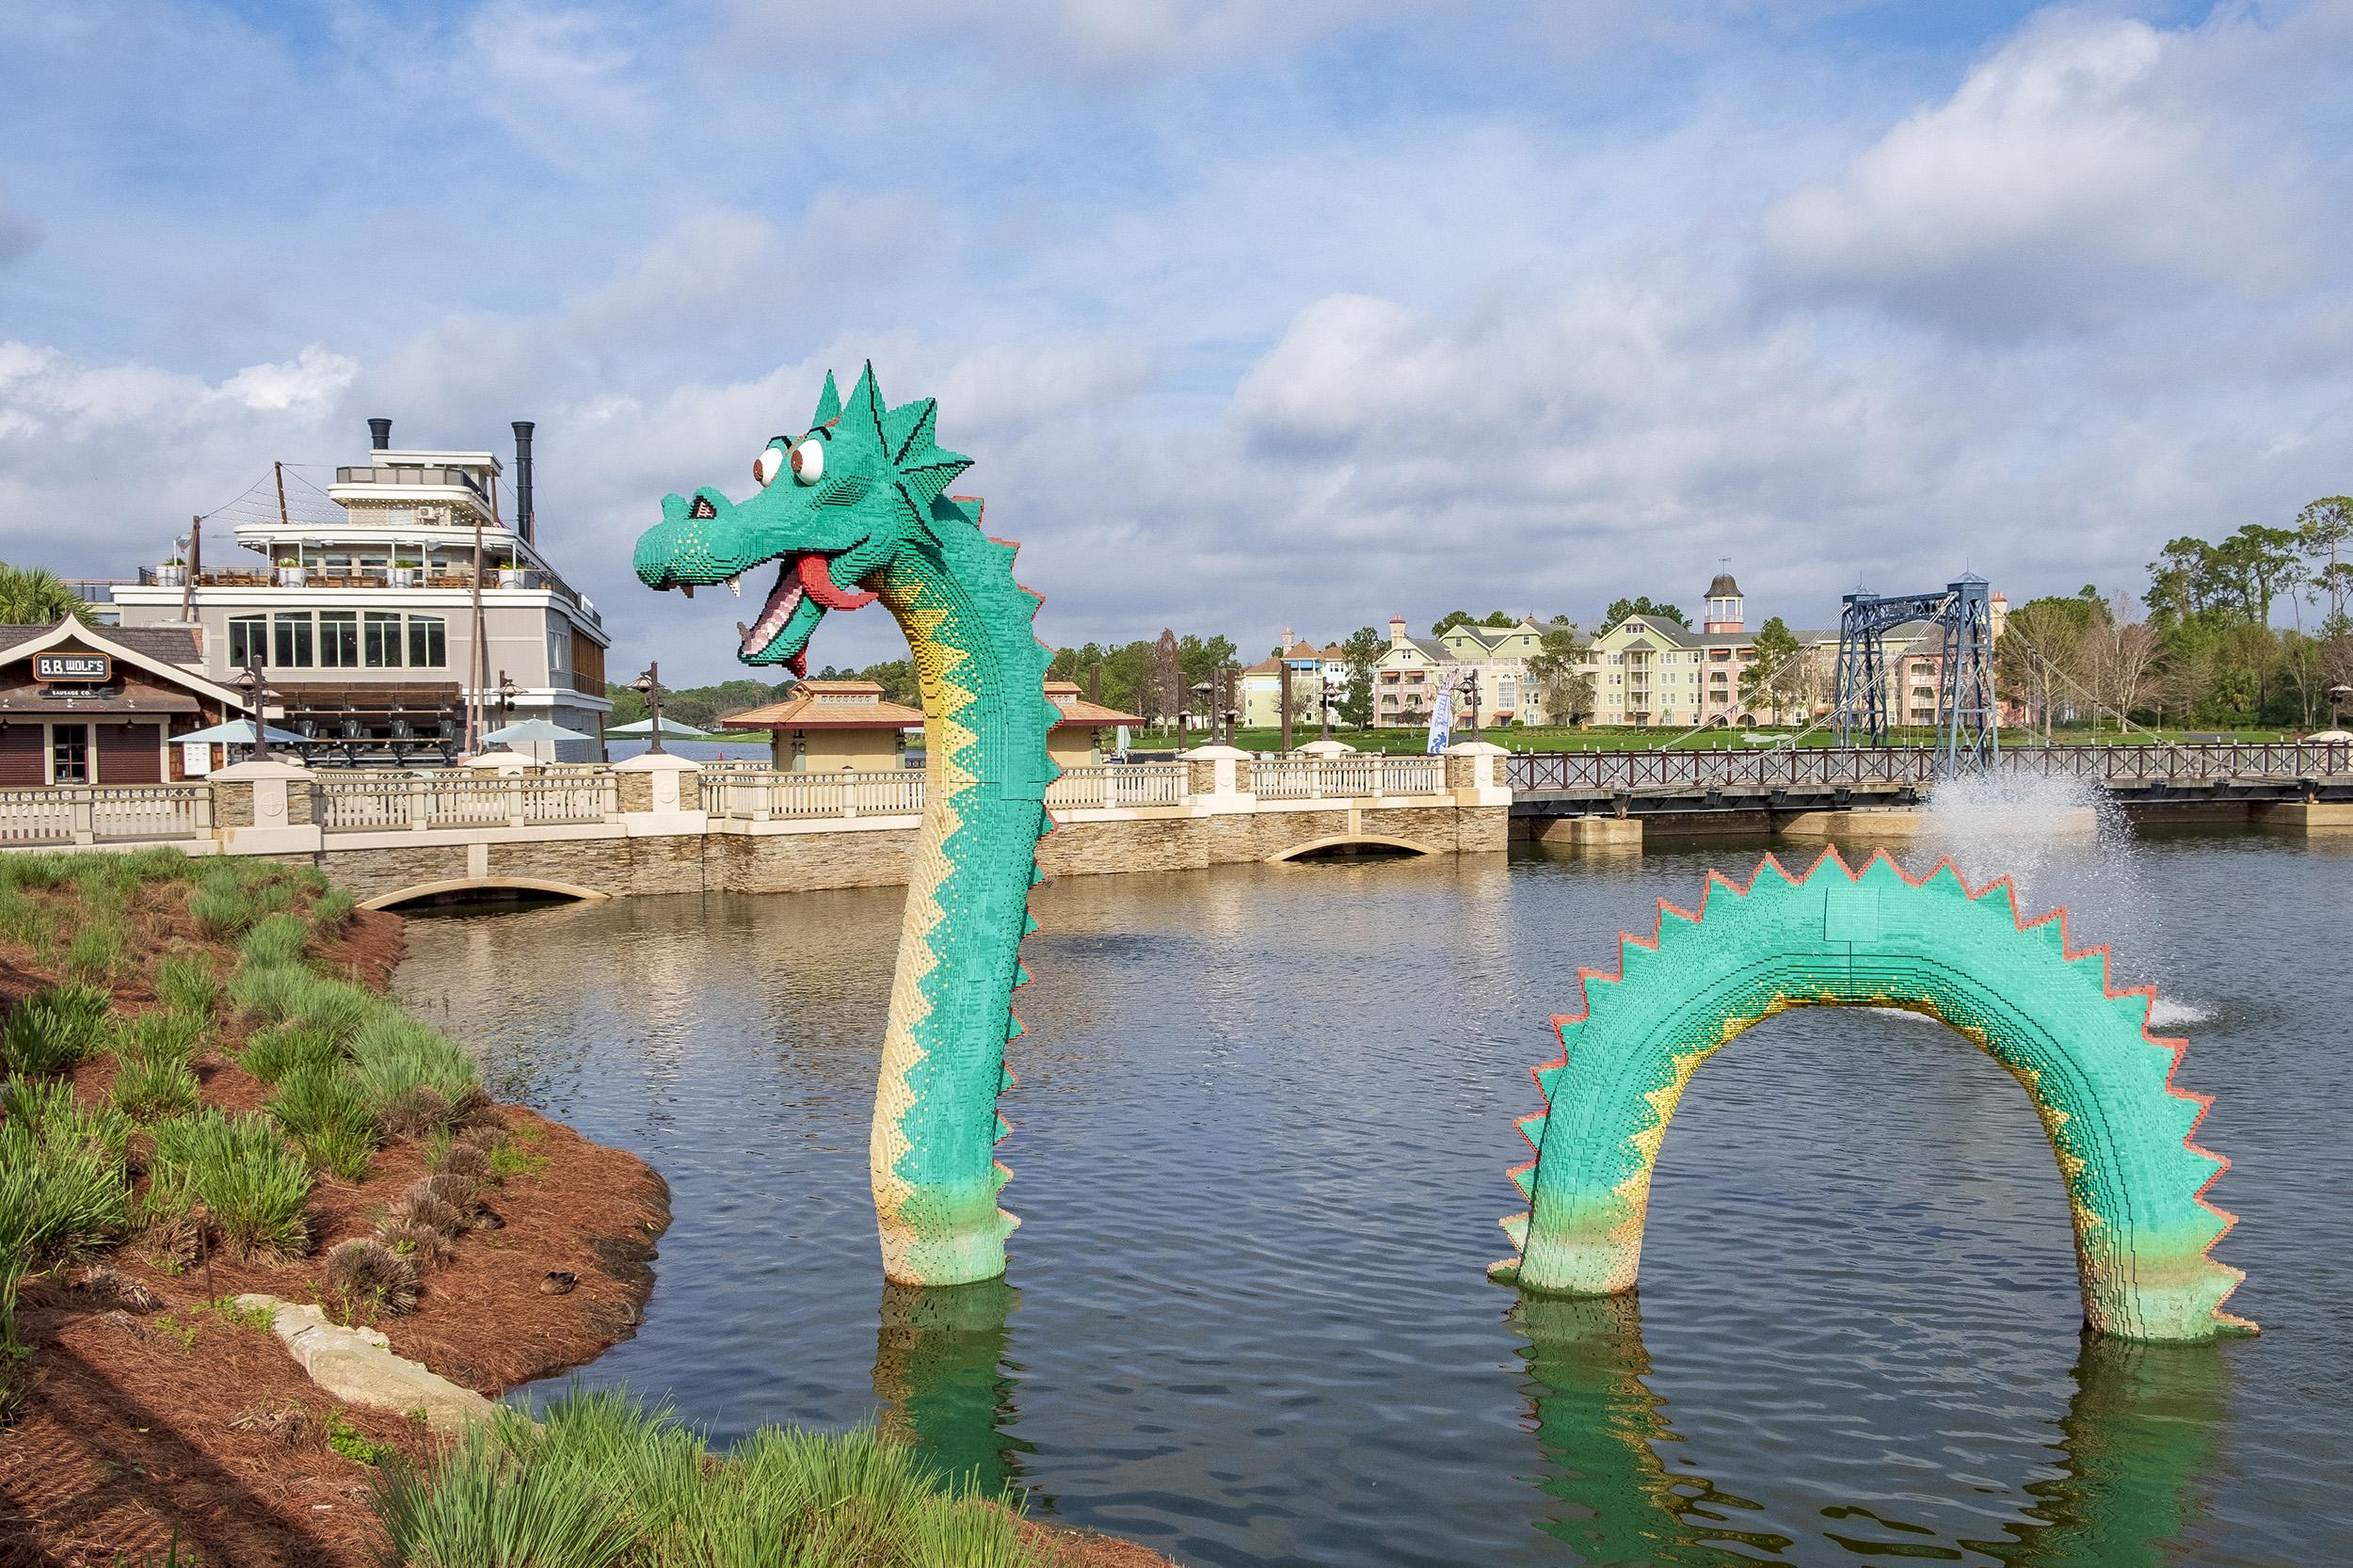 Lego Drake Disney Springs Orlando